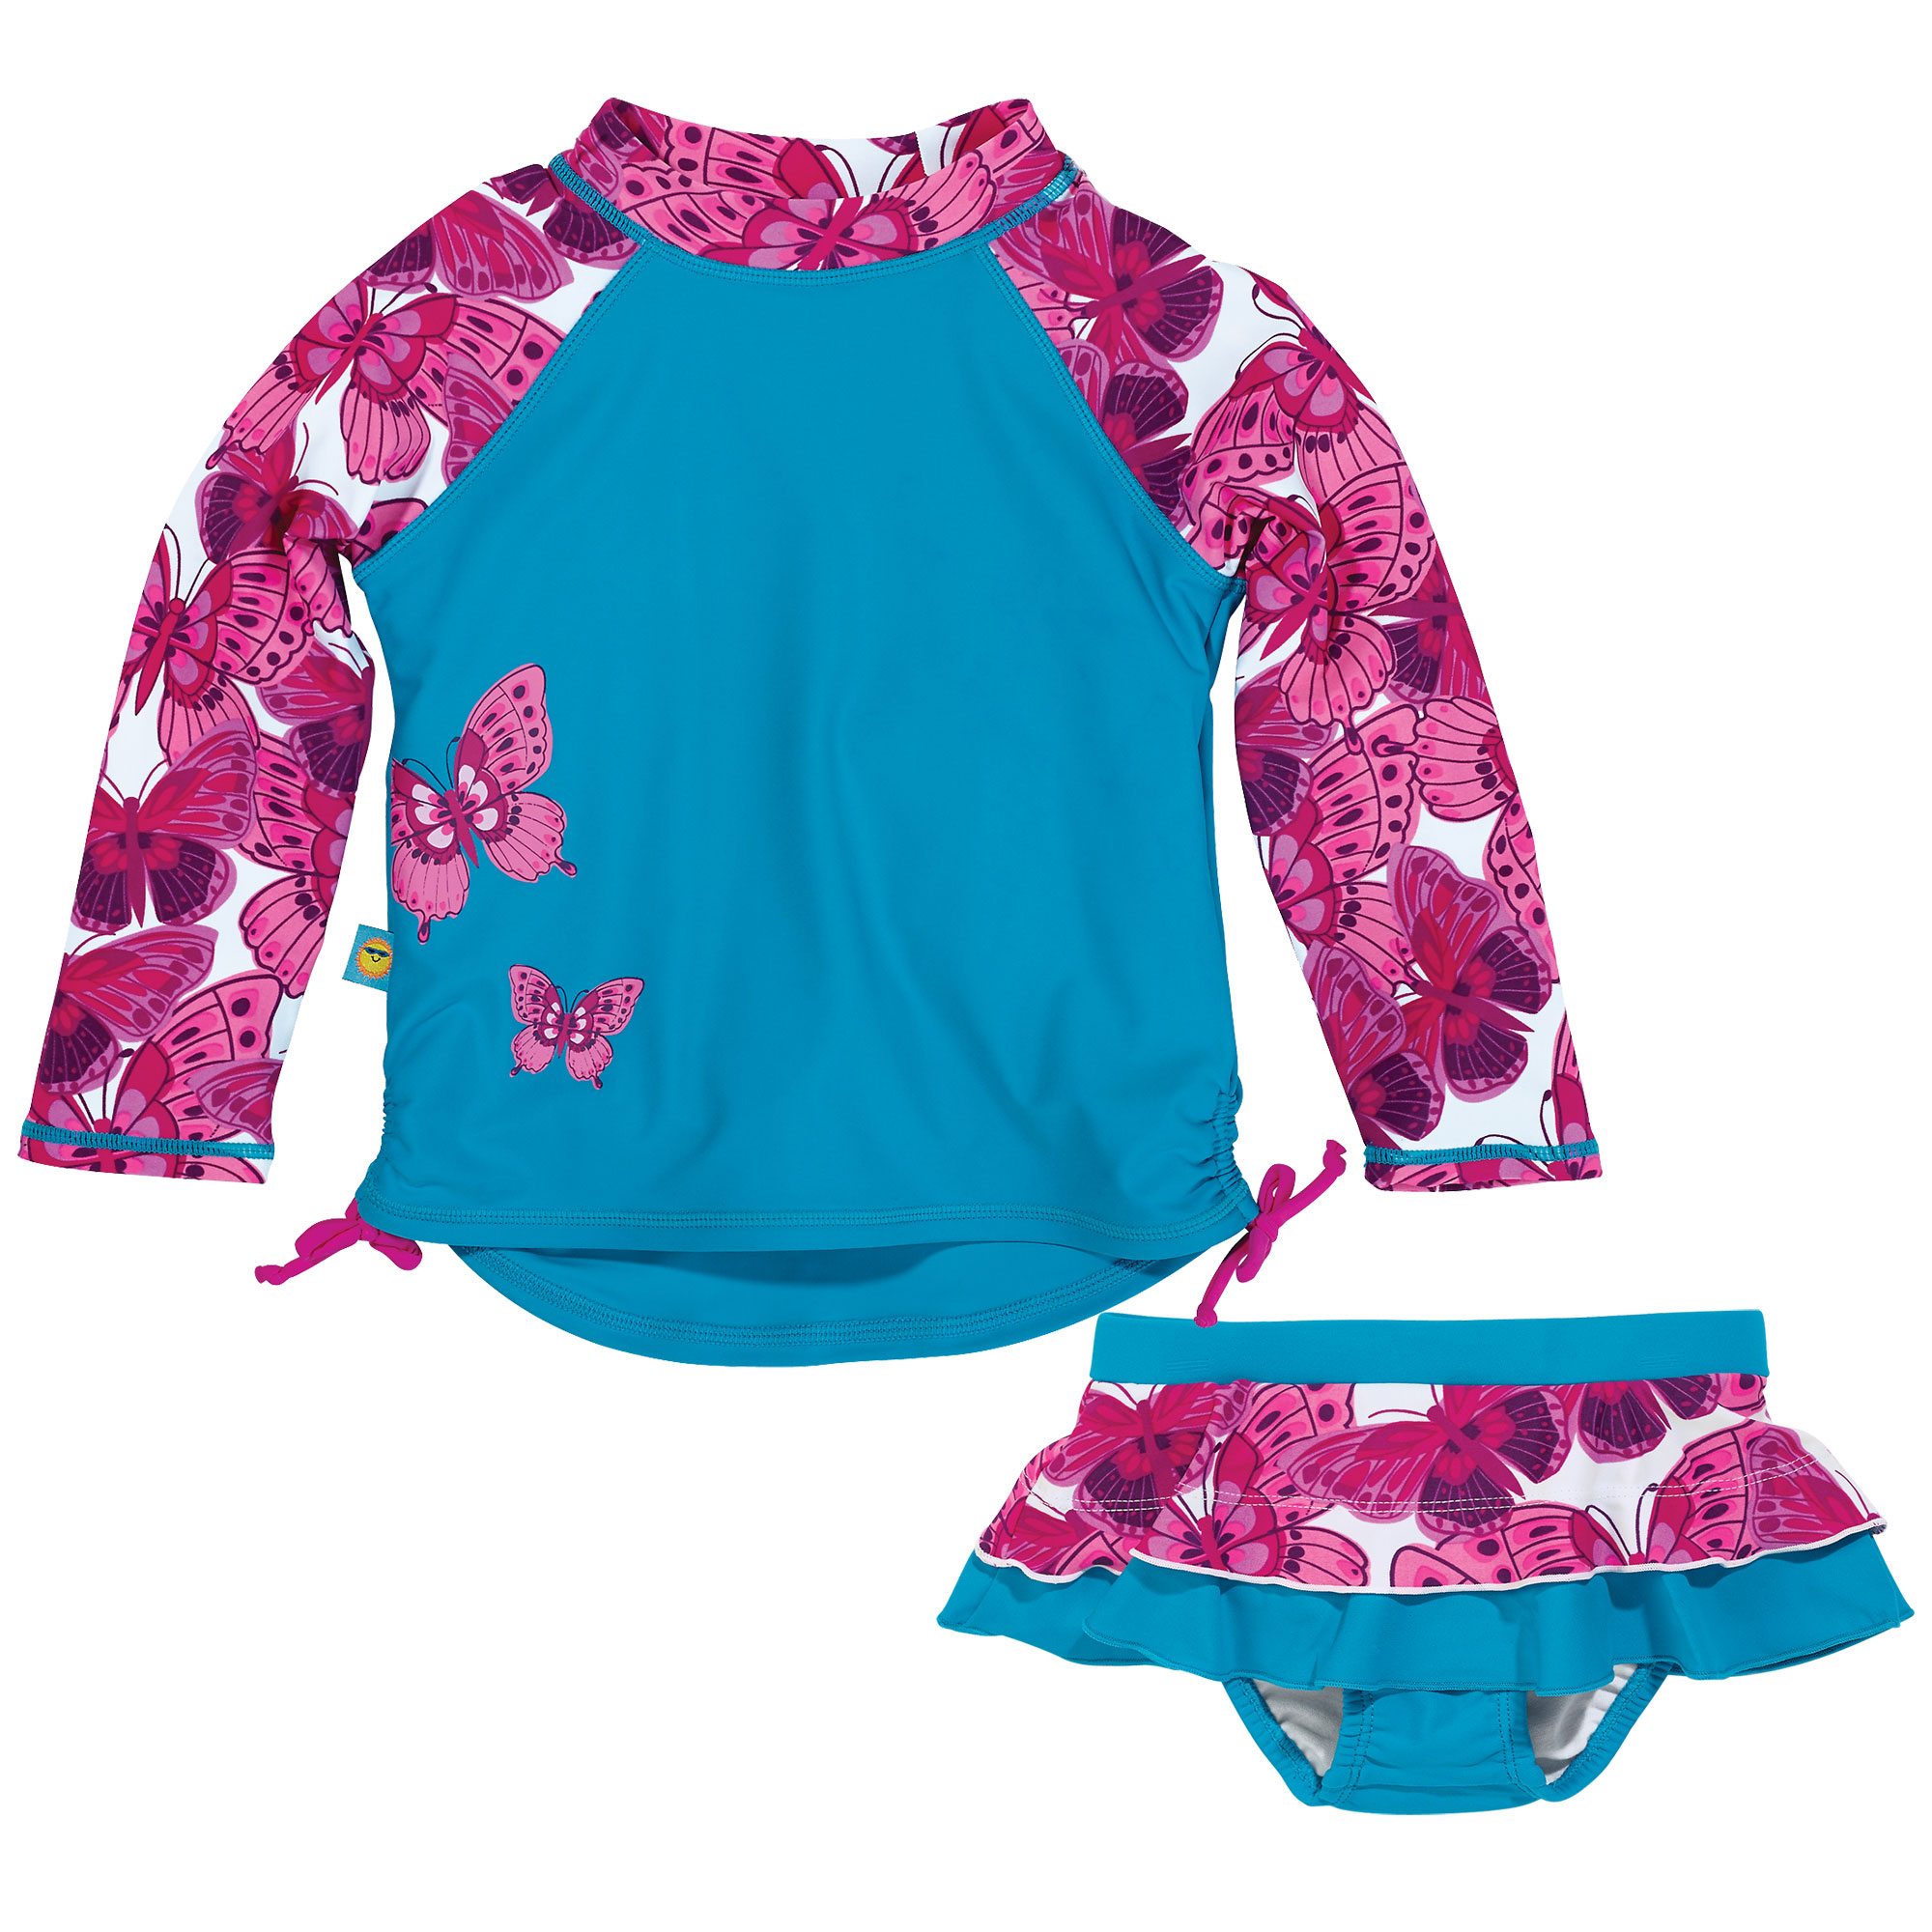 Sun Smarties Baby Girl Swim Diaper Skirt and Rashguard - Blue with Pink Butterflies - 2 Piece Swimsuit